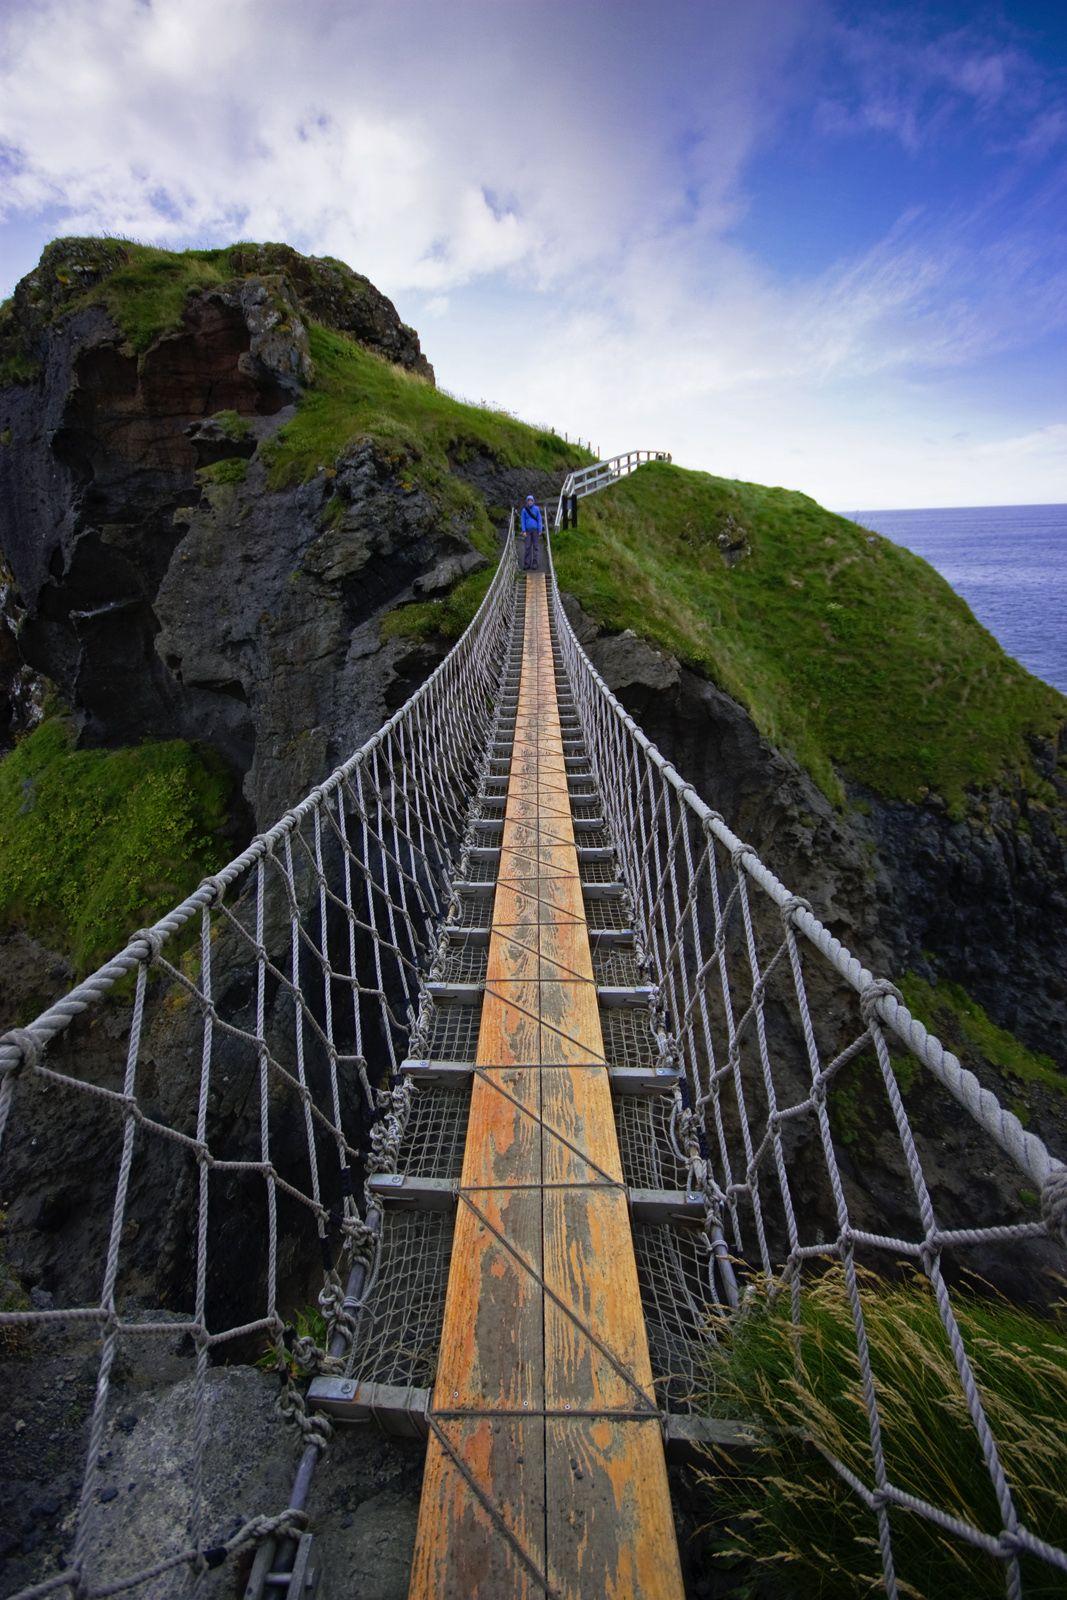 Carrick-a-Rede Rope Bridge, Ireland.